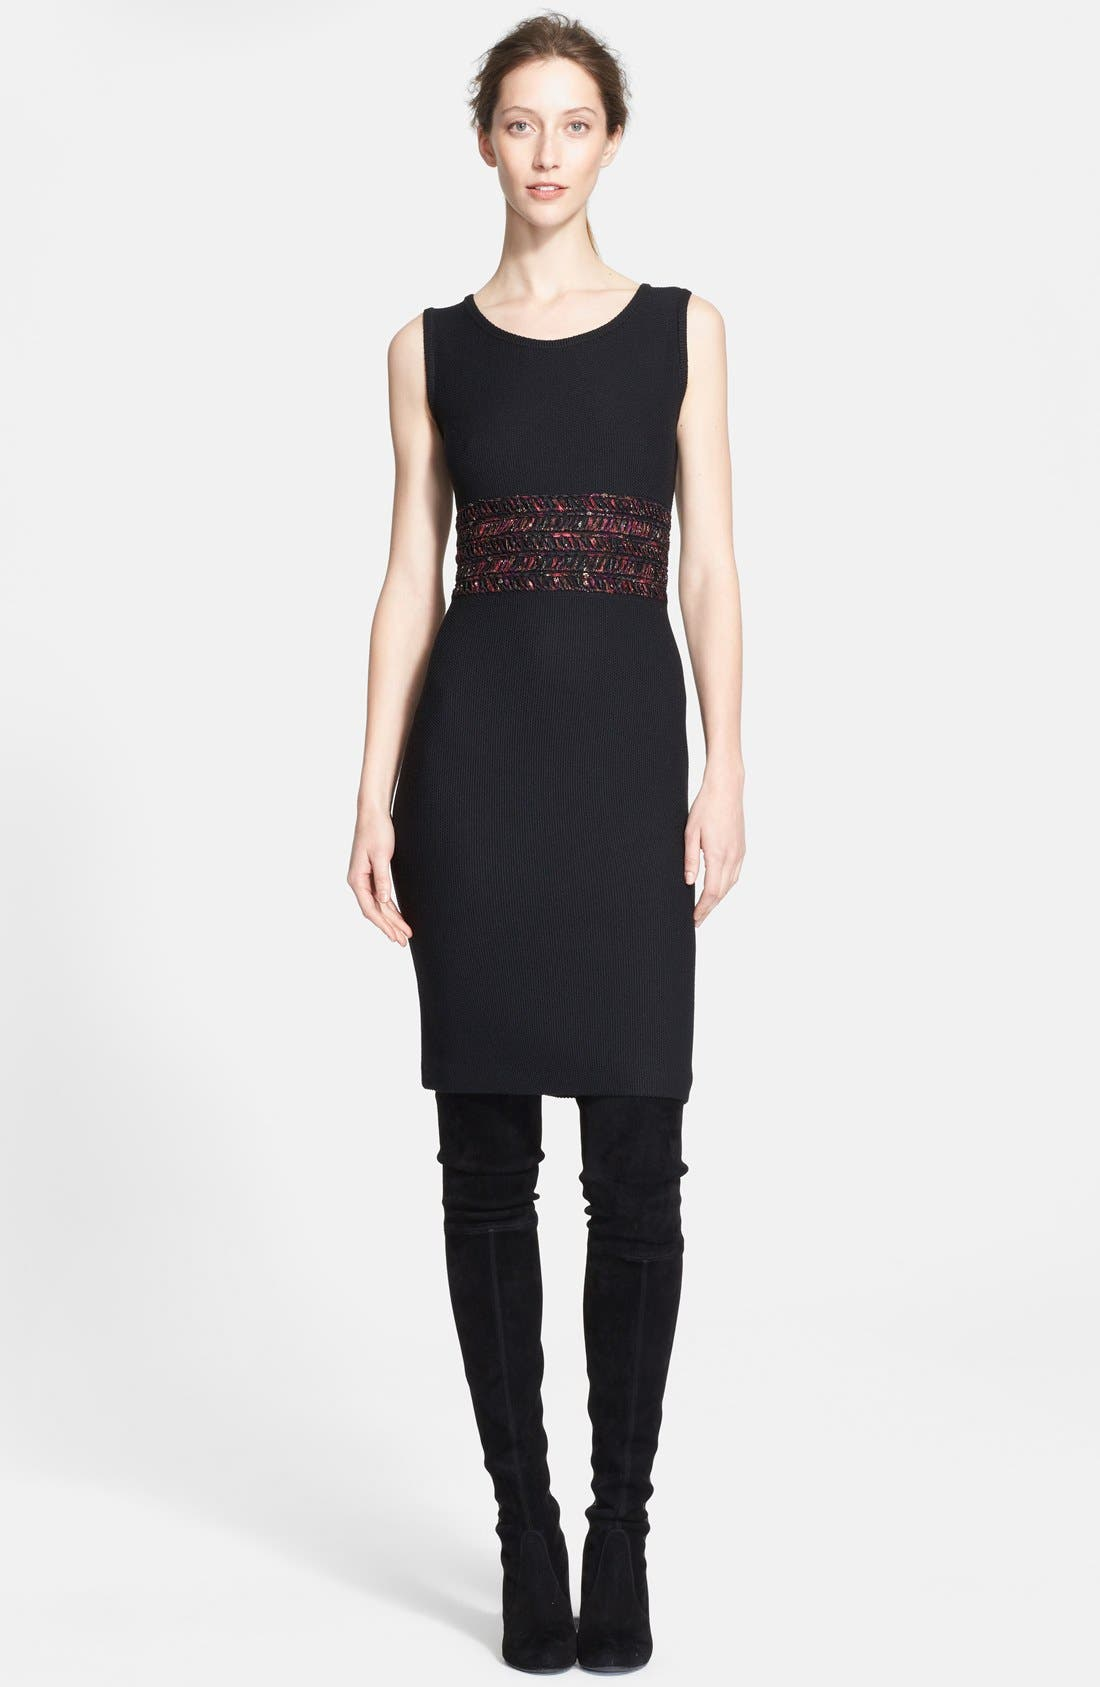 Alternate Image 1 Selected - St. John Collection Novelty Ribbon Knit Dress